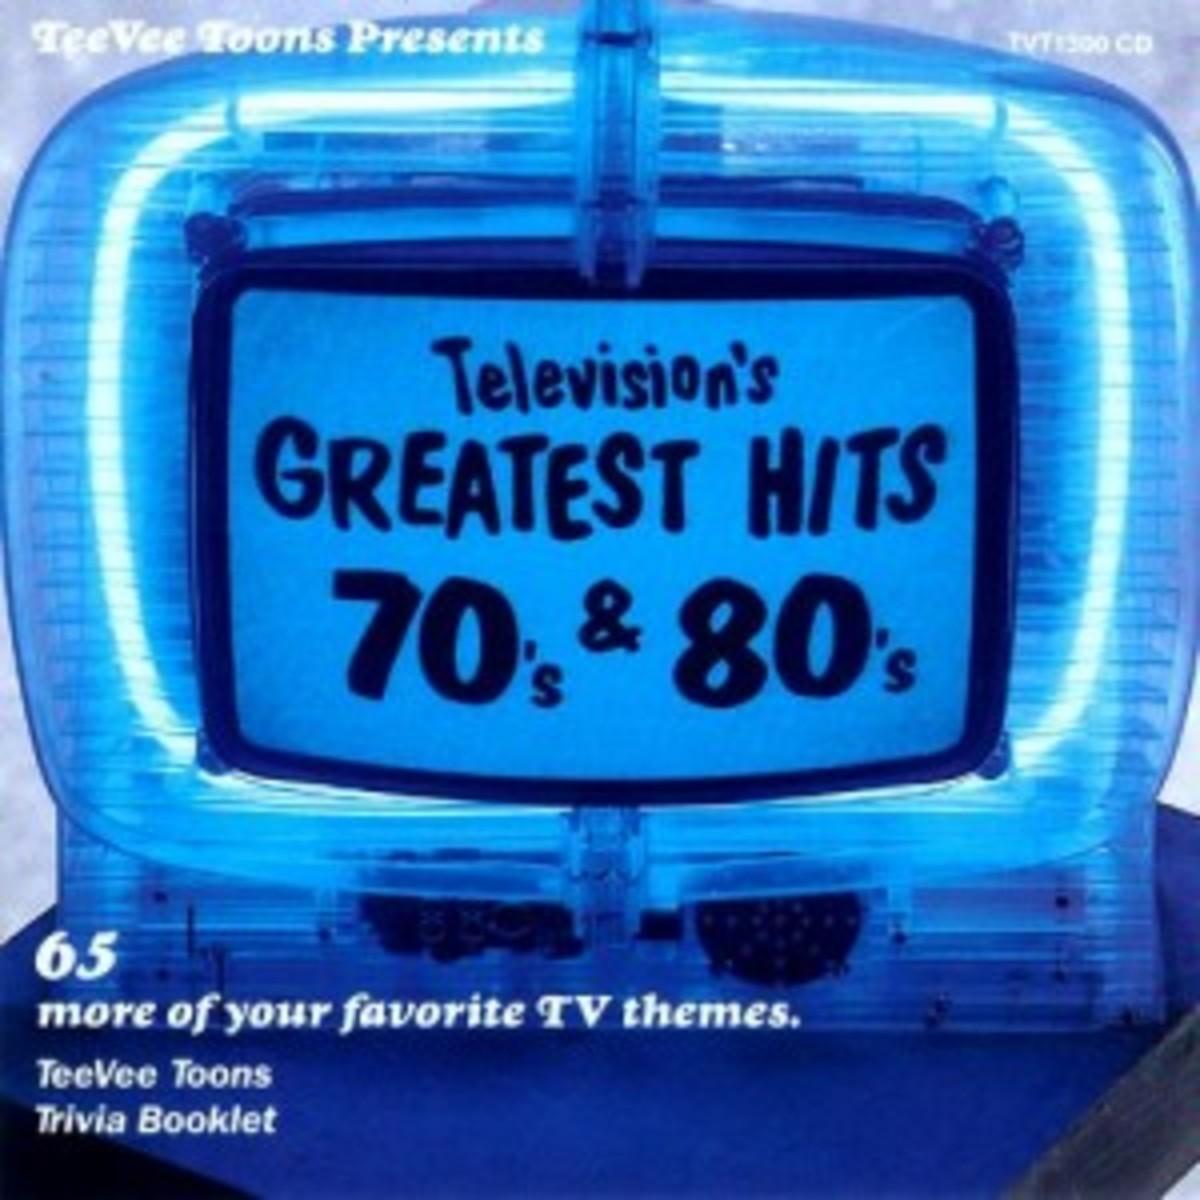 TeeVee Toons Presents Television's Greatest Hits, Vol. 3 70's & 80's [Soundtrack] album